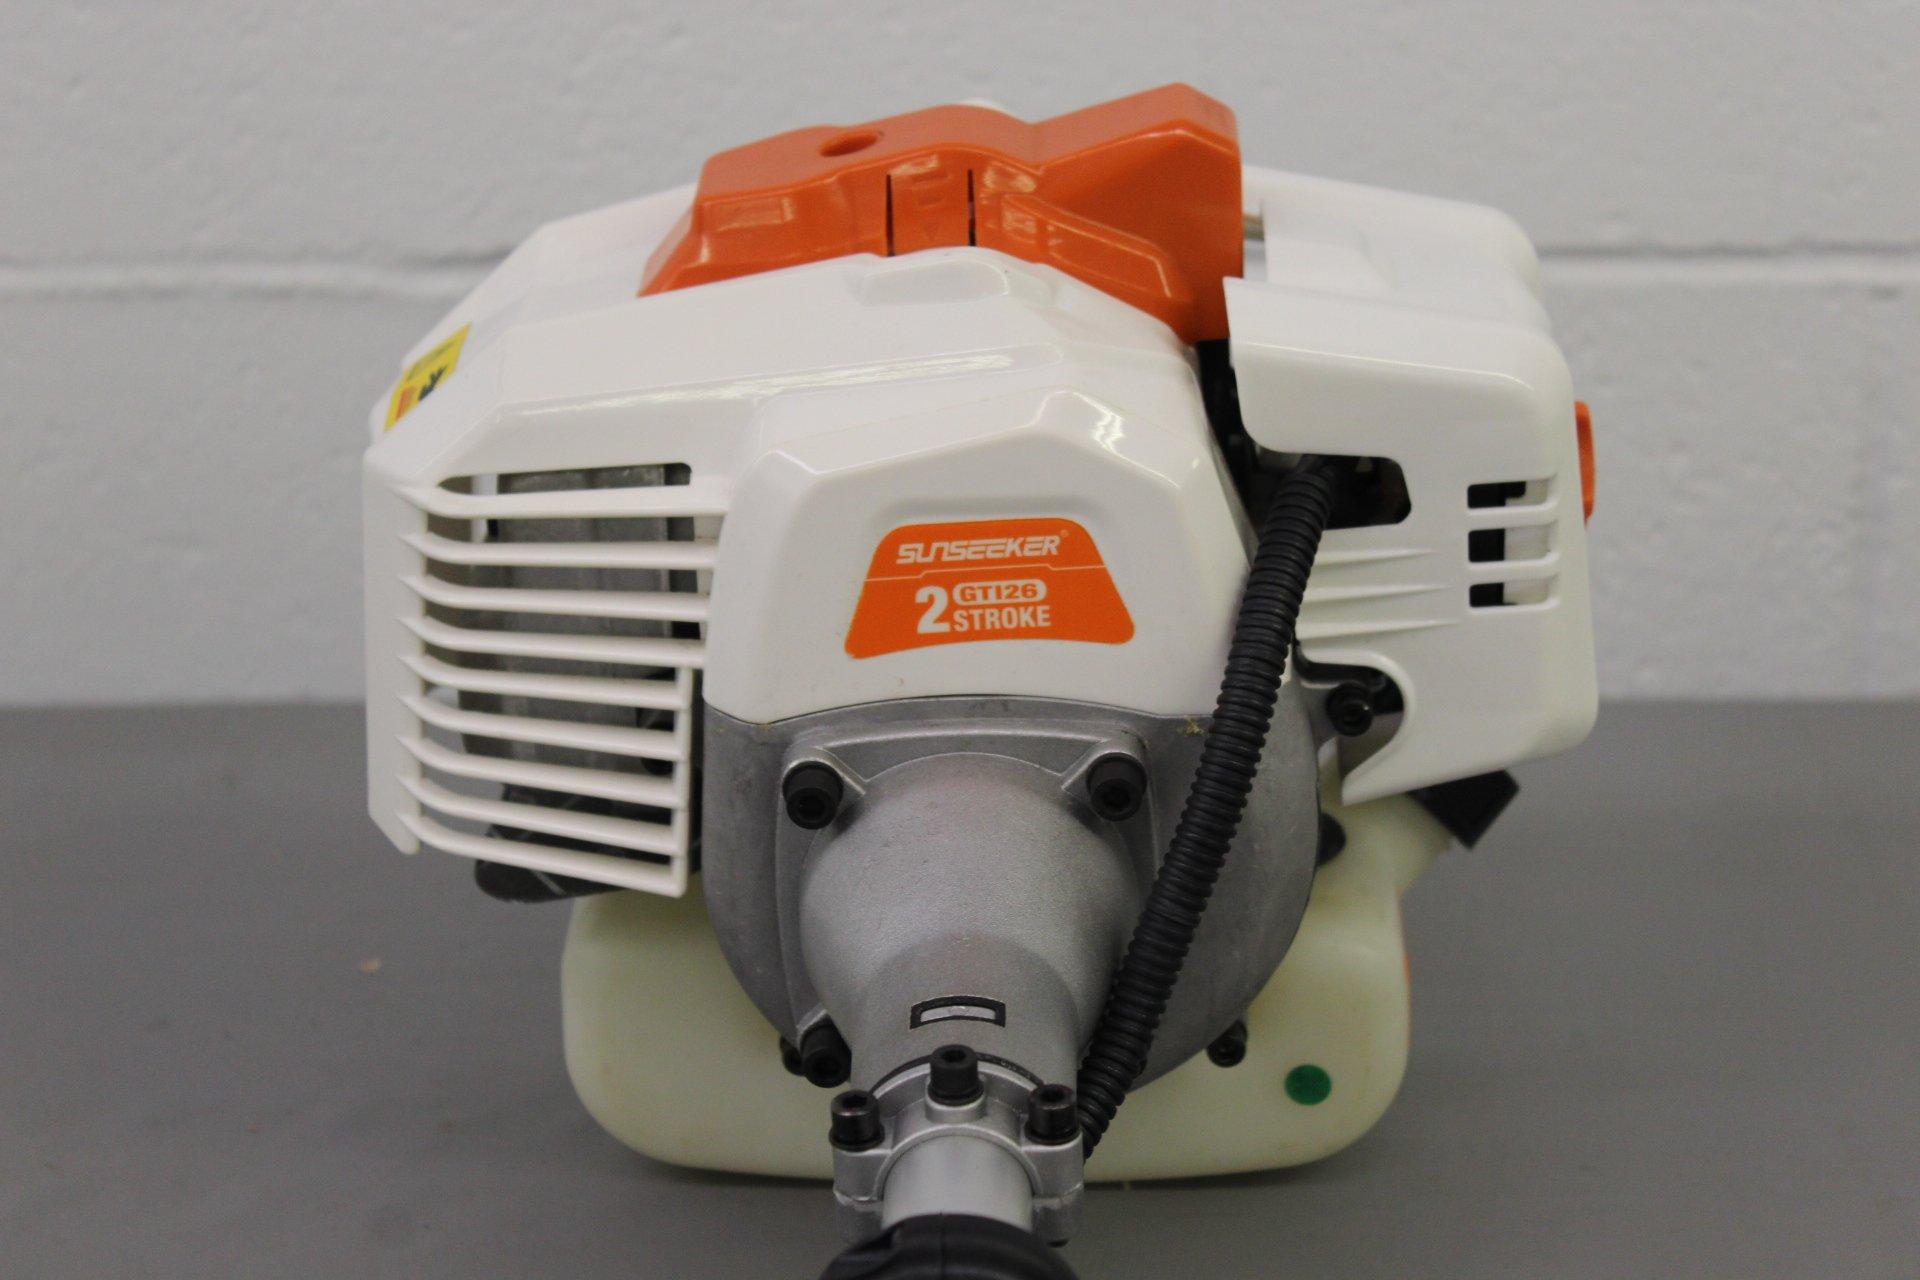 GTI26-PH: PH - GTI26. Power Head: GTI26